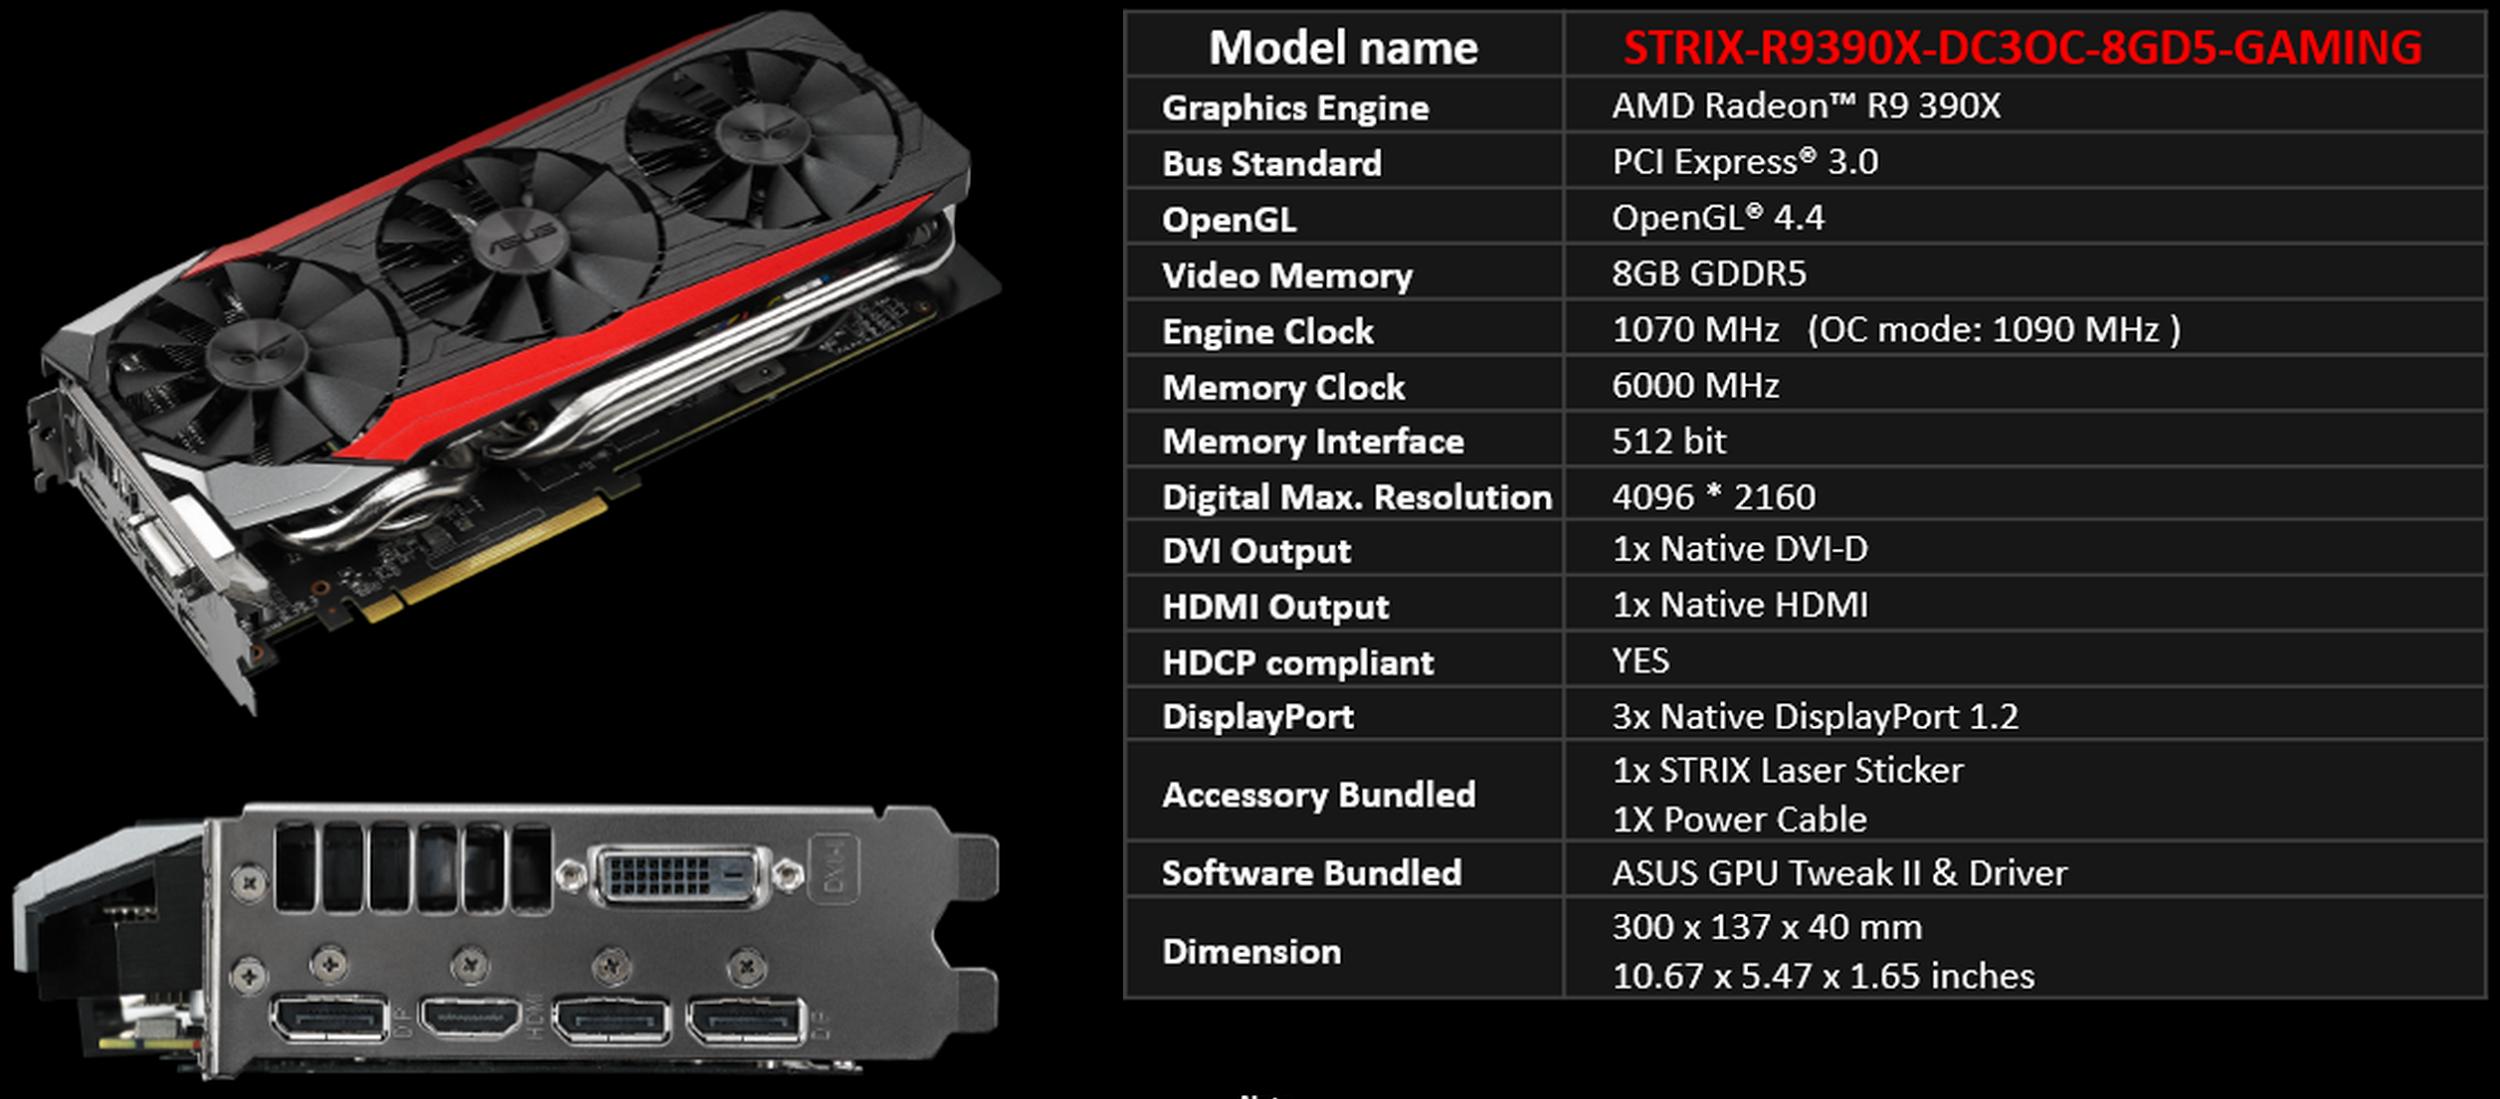 Рис. 2. Видеокарта серии R9 390X с основными характеристиками